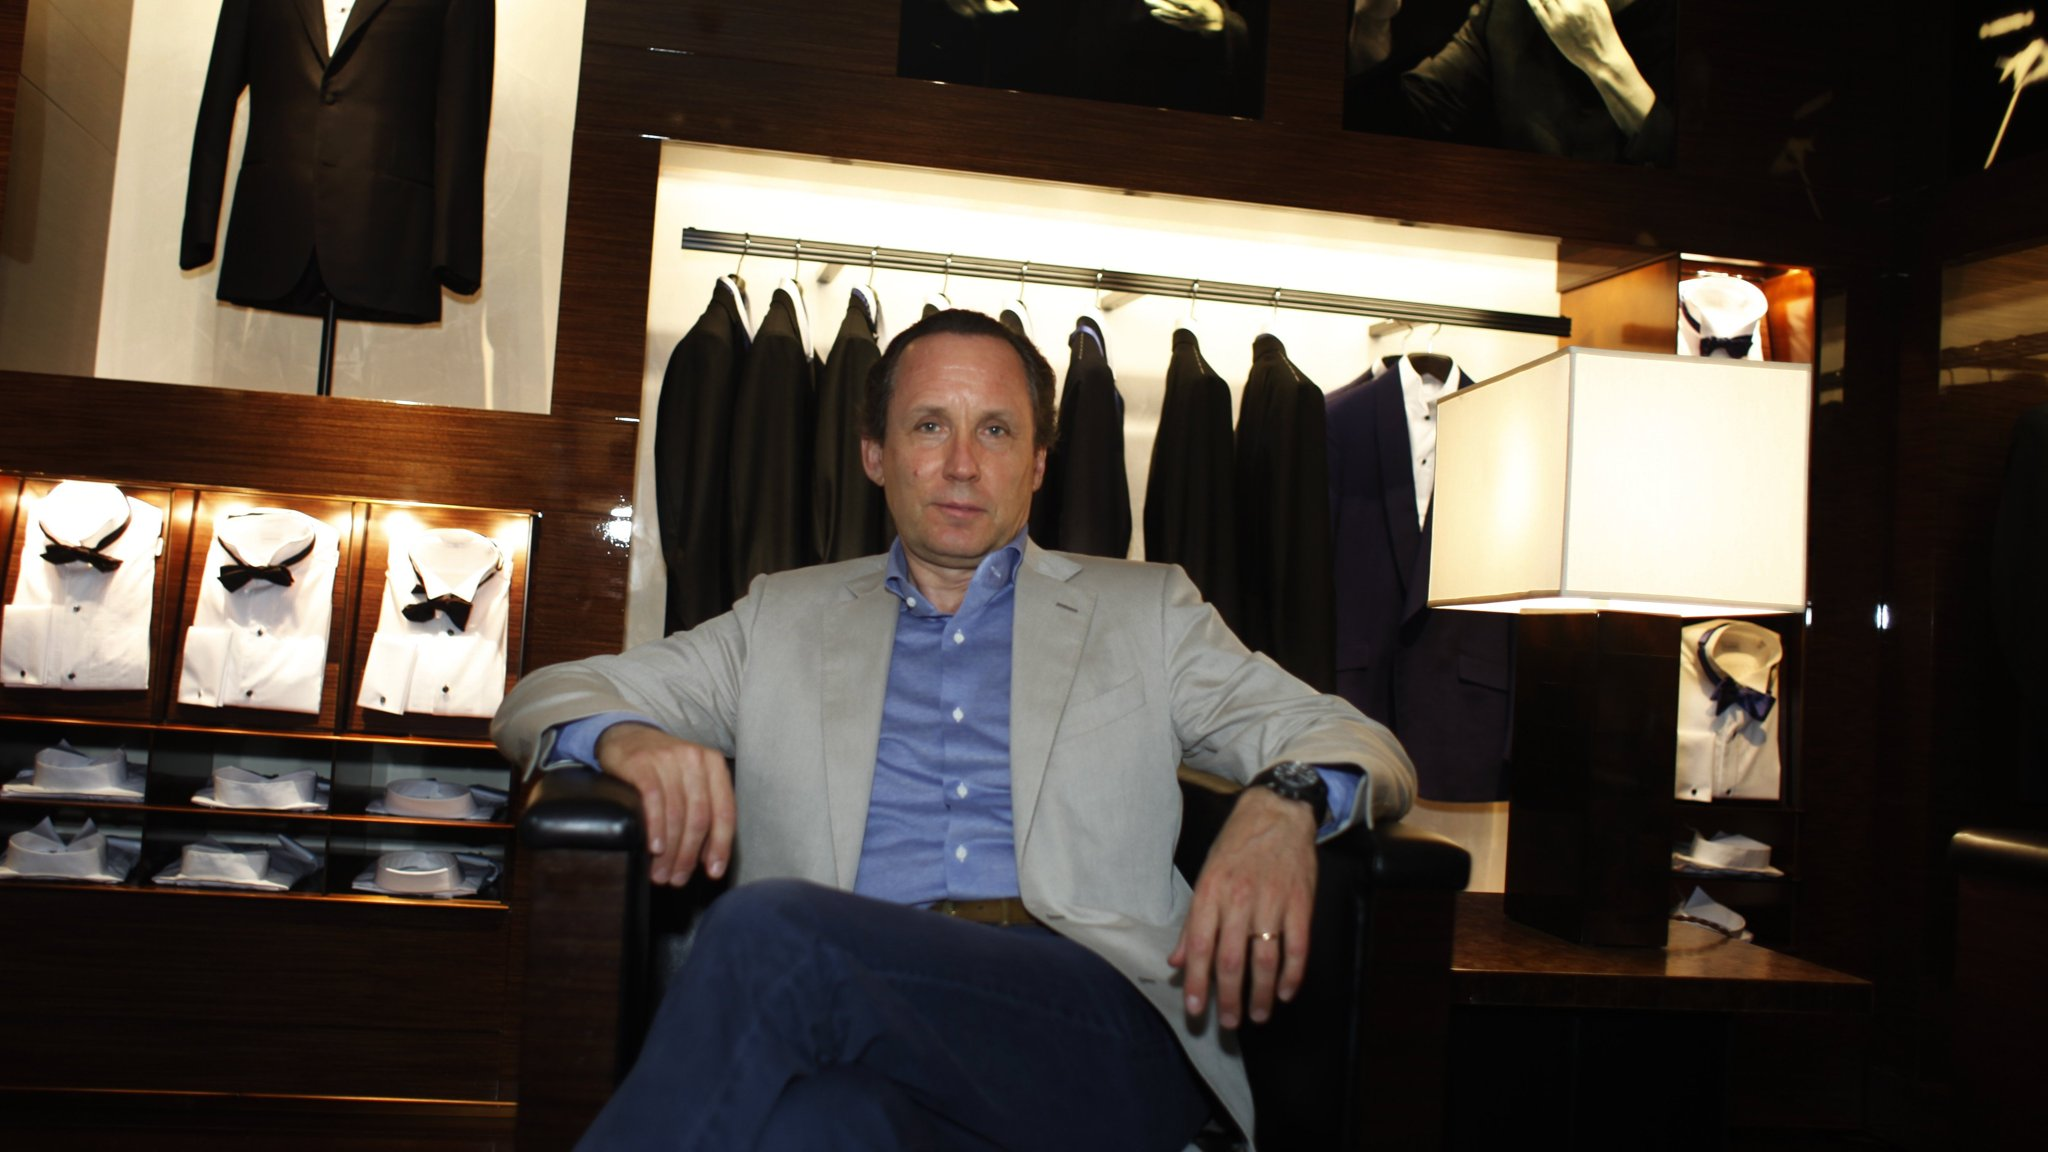 Italy's Ermenegildo Zegna buys US label Thom Browne